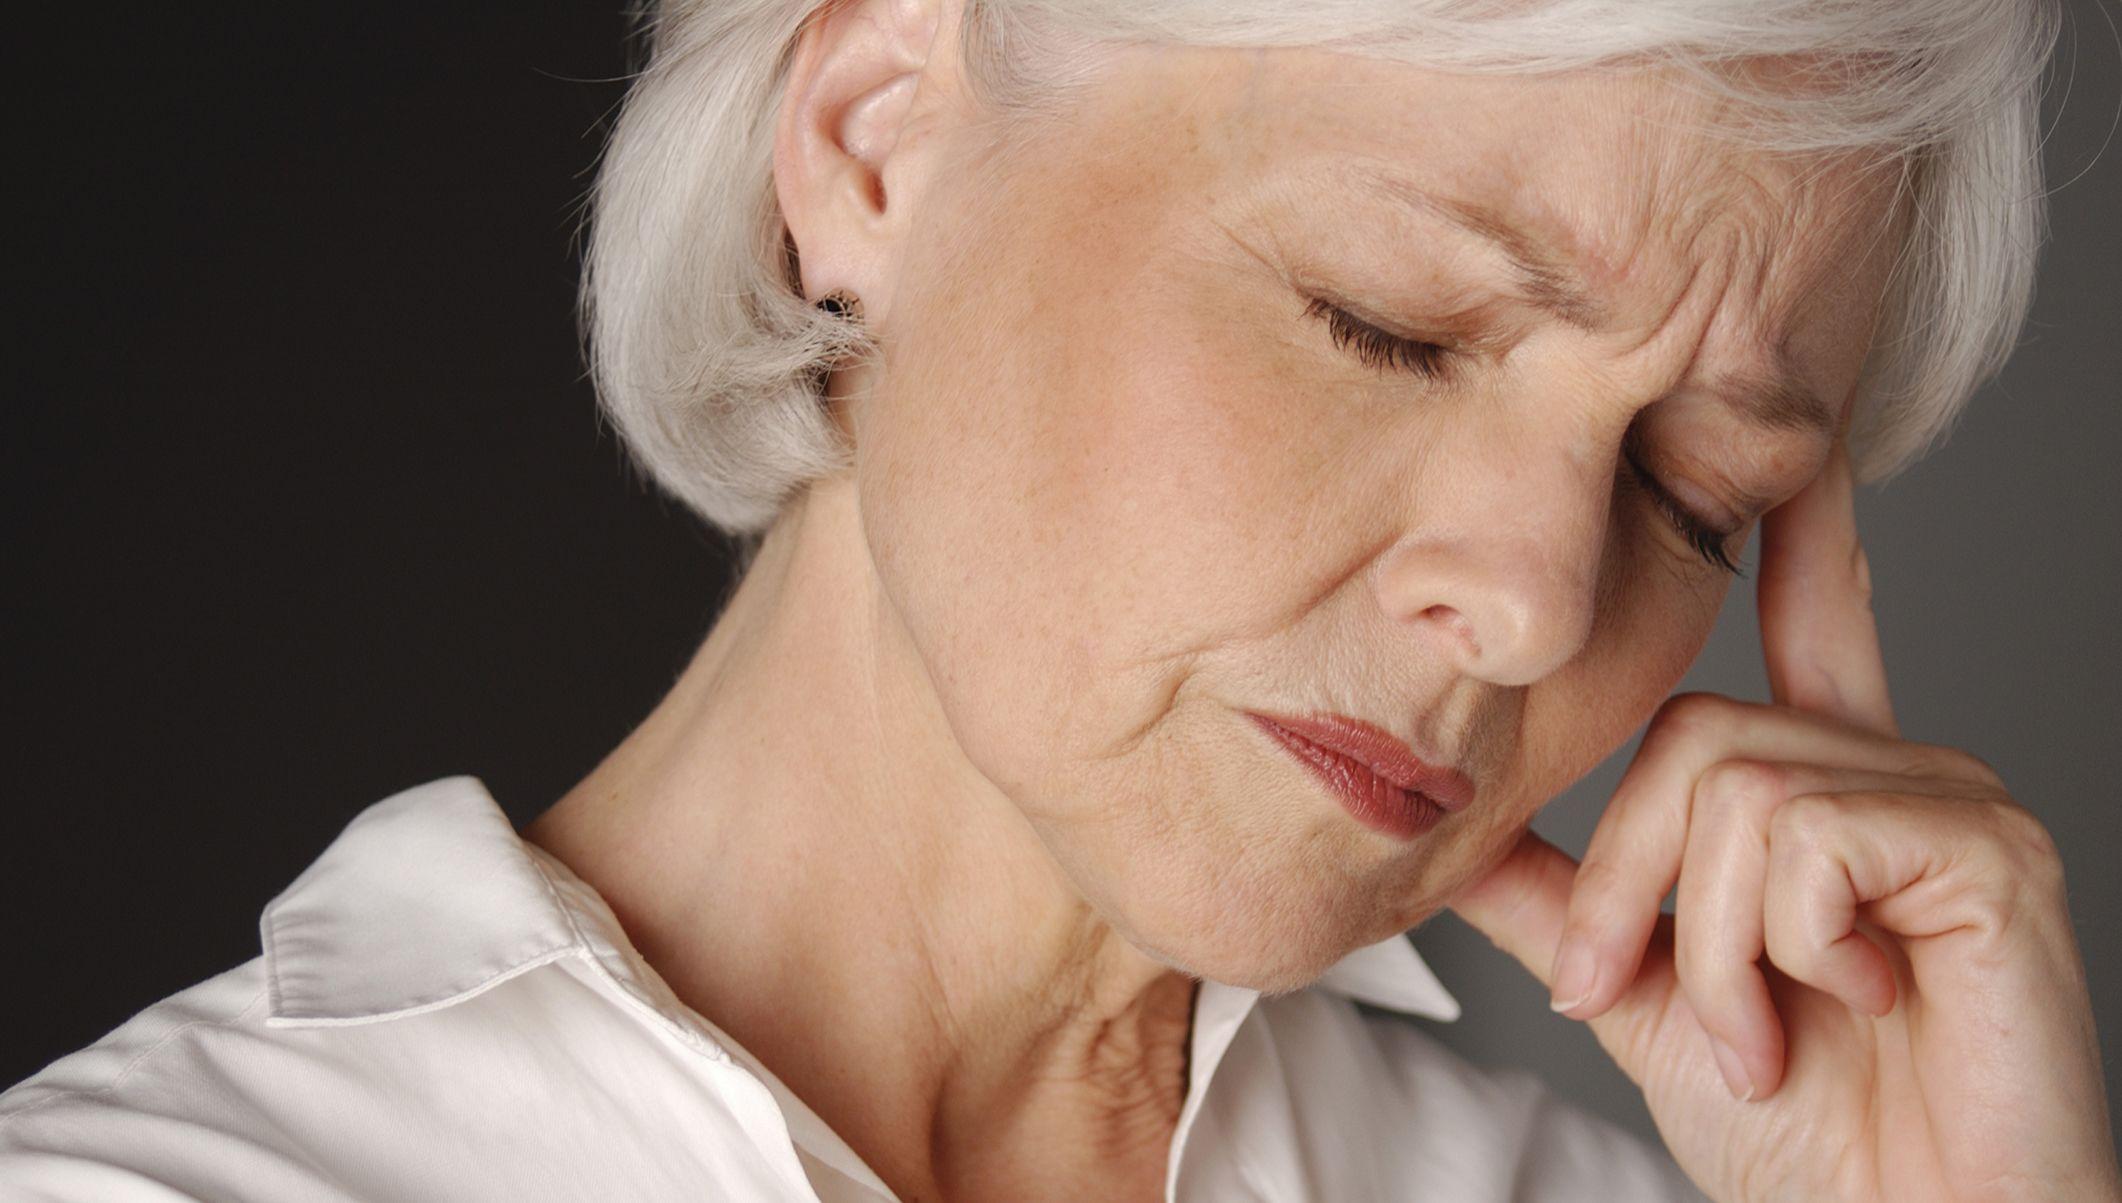 7-Step Chronic Pain Management Plan